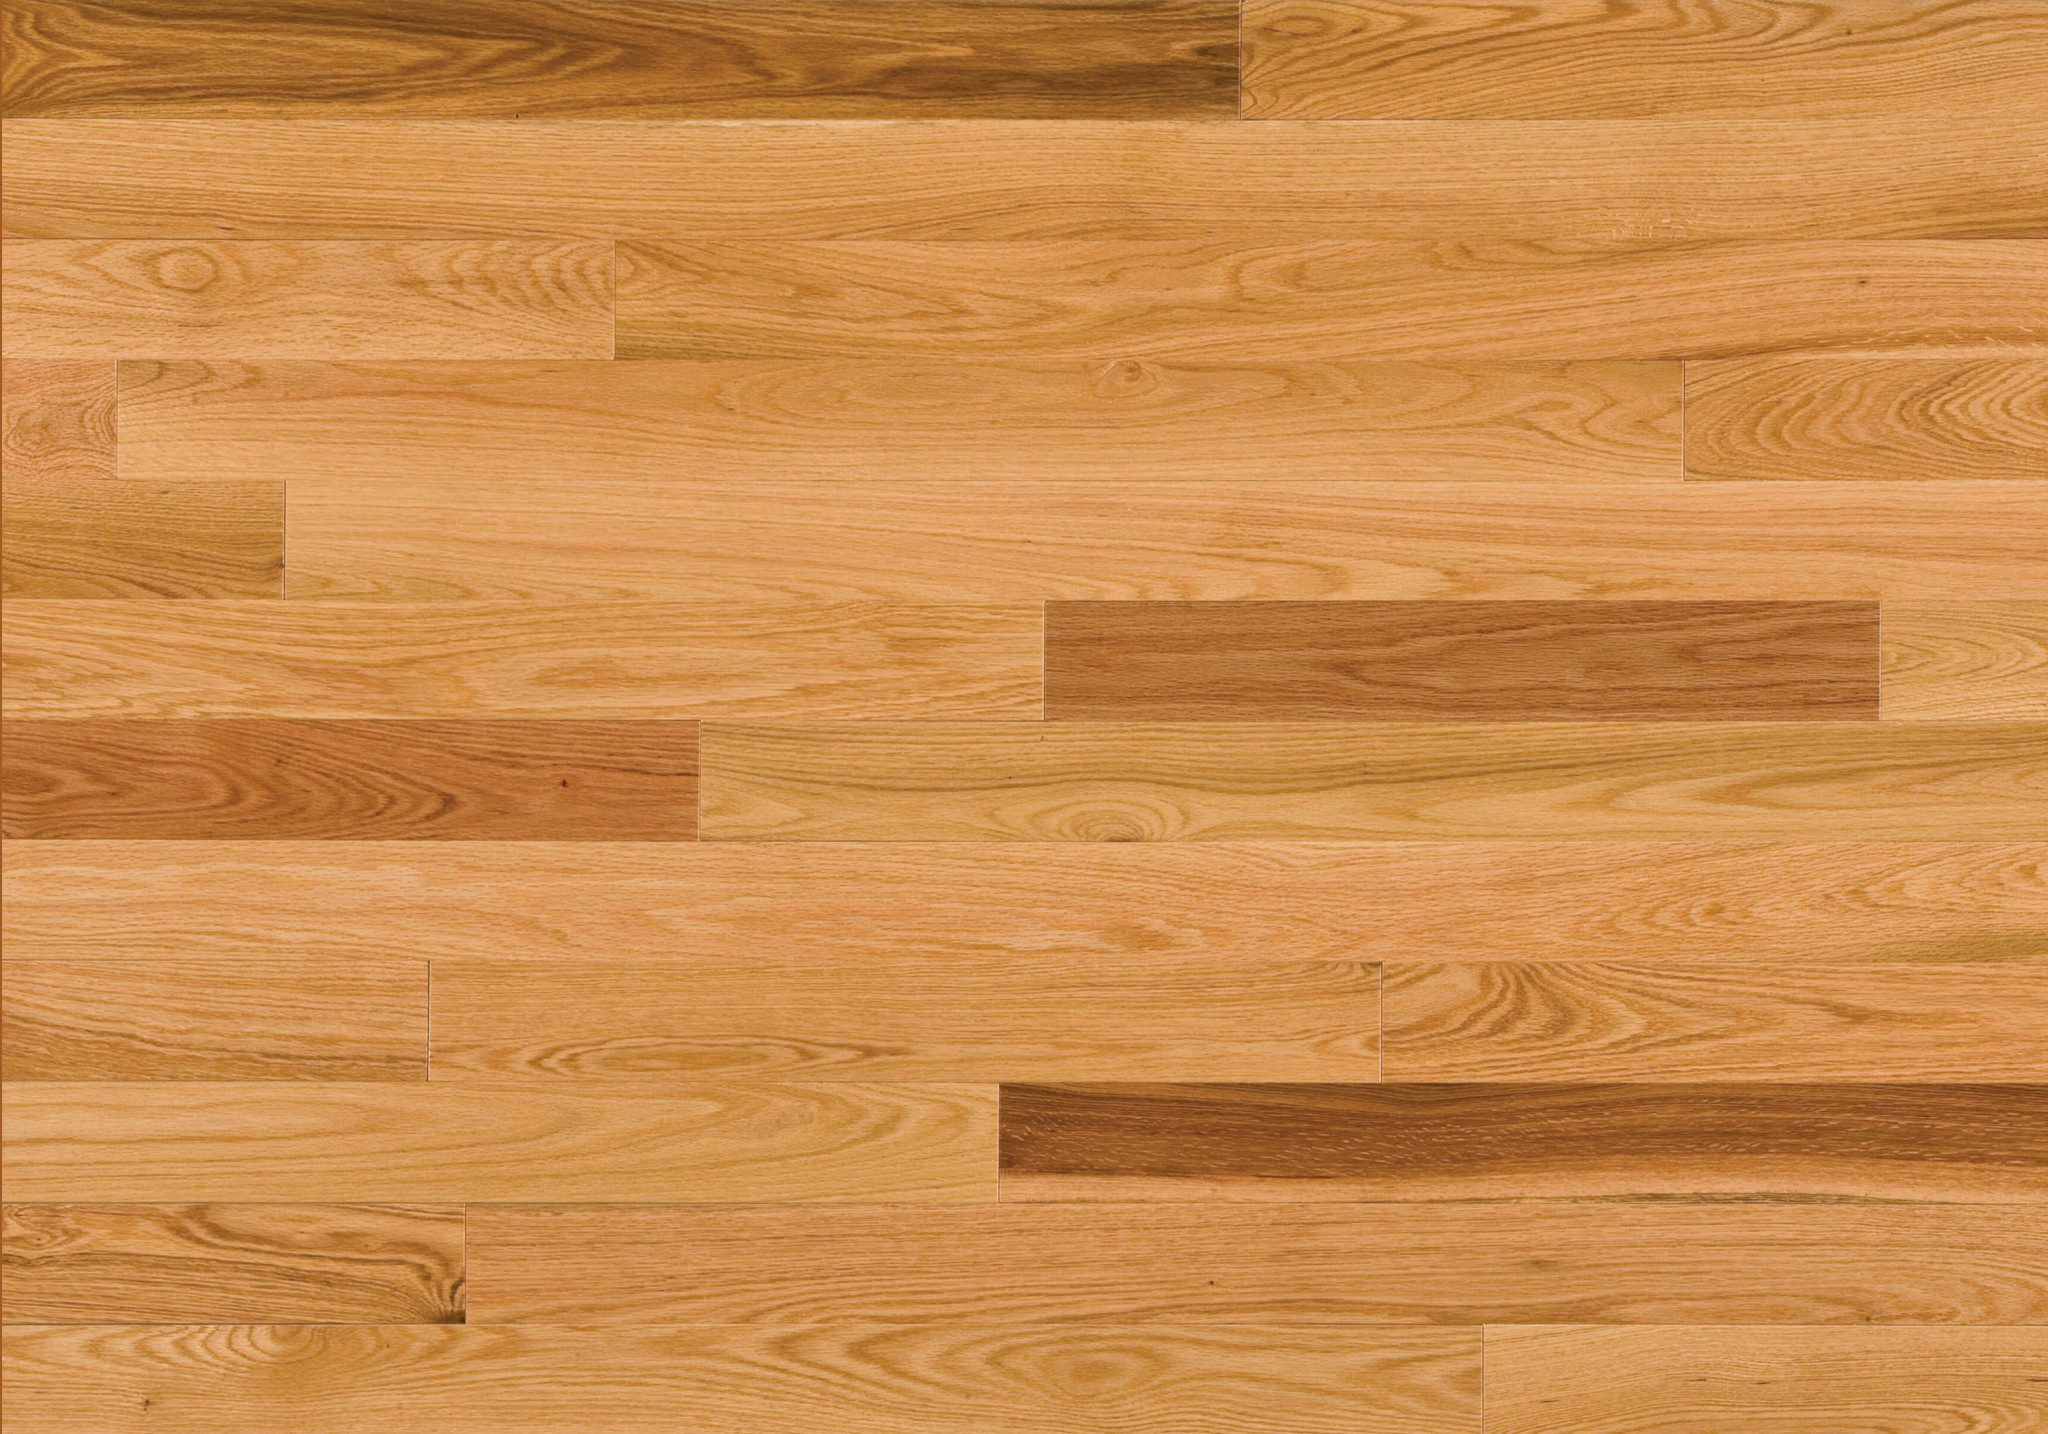 Red Oak Natural Expert Engineered 3-1/8